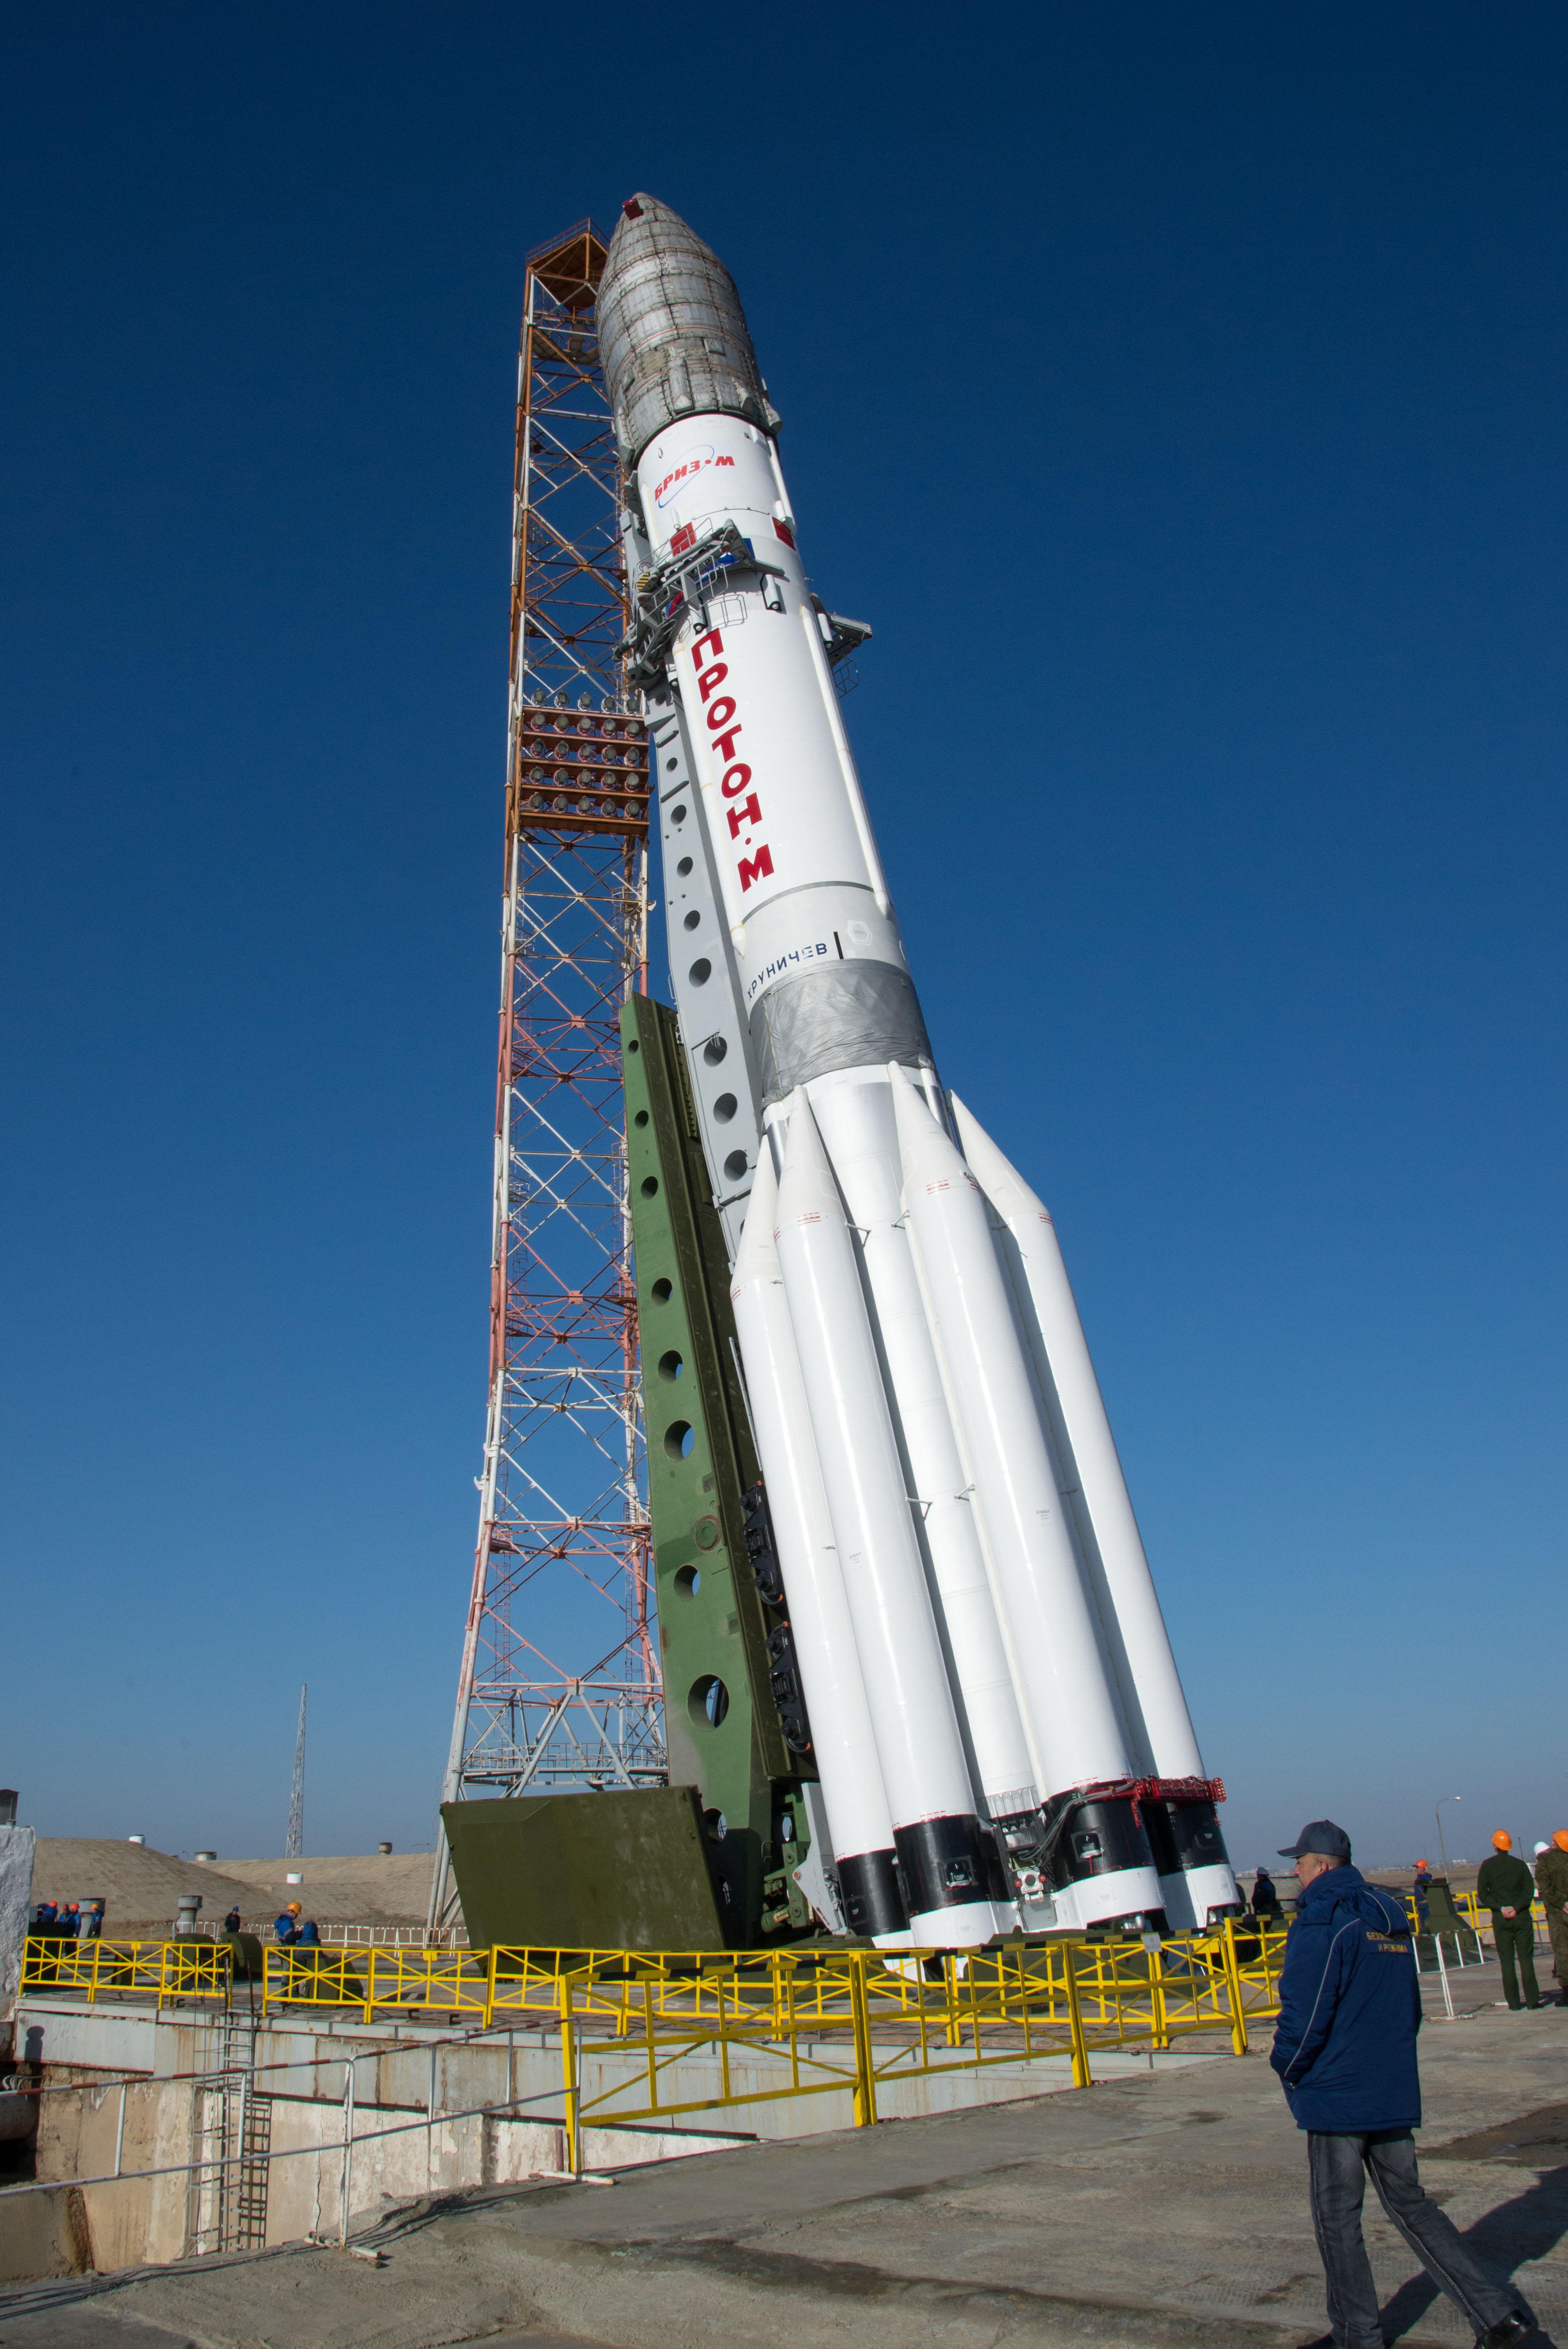 1567215224438-ExoMars2016_proton_launch_pad_160311-LC-AIT-32px.jpg